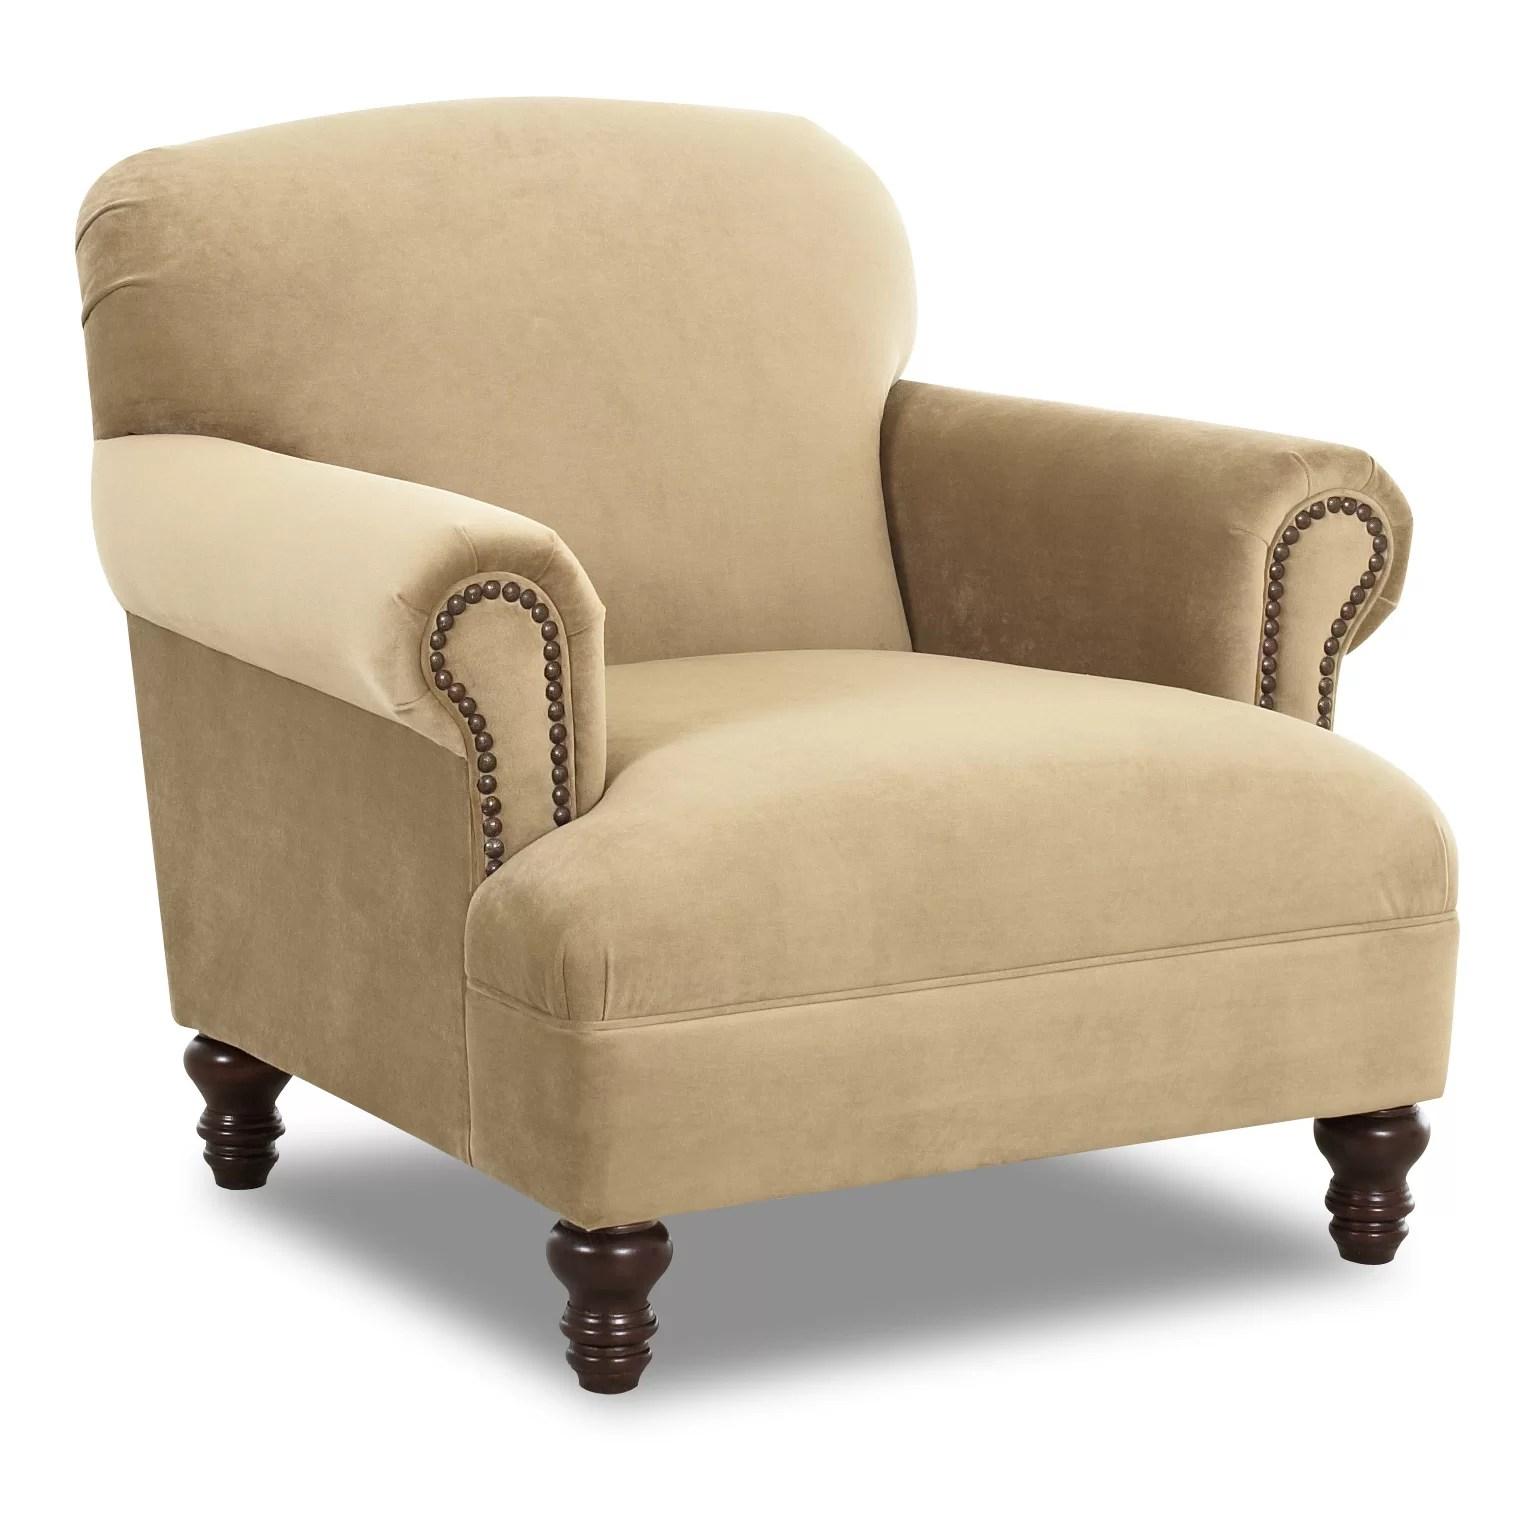 Klaussner Furniture Bailey Chair  Reviews  Wayfair